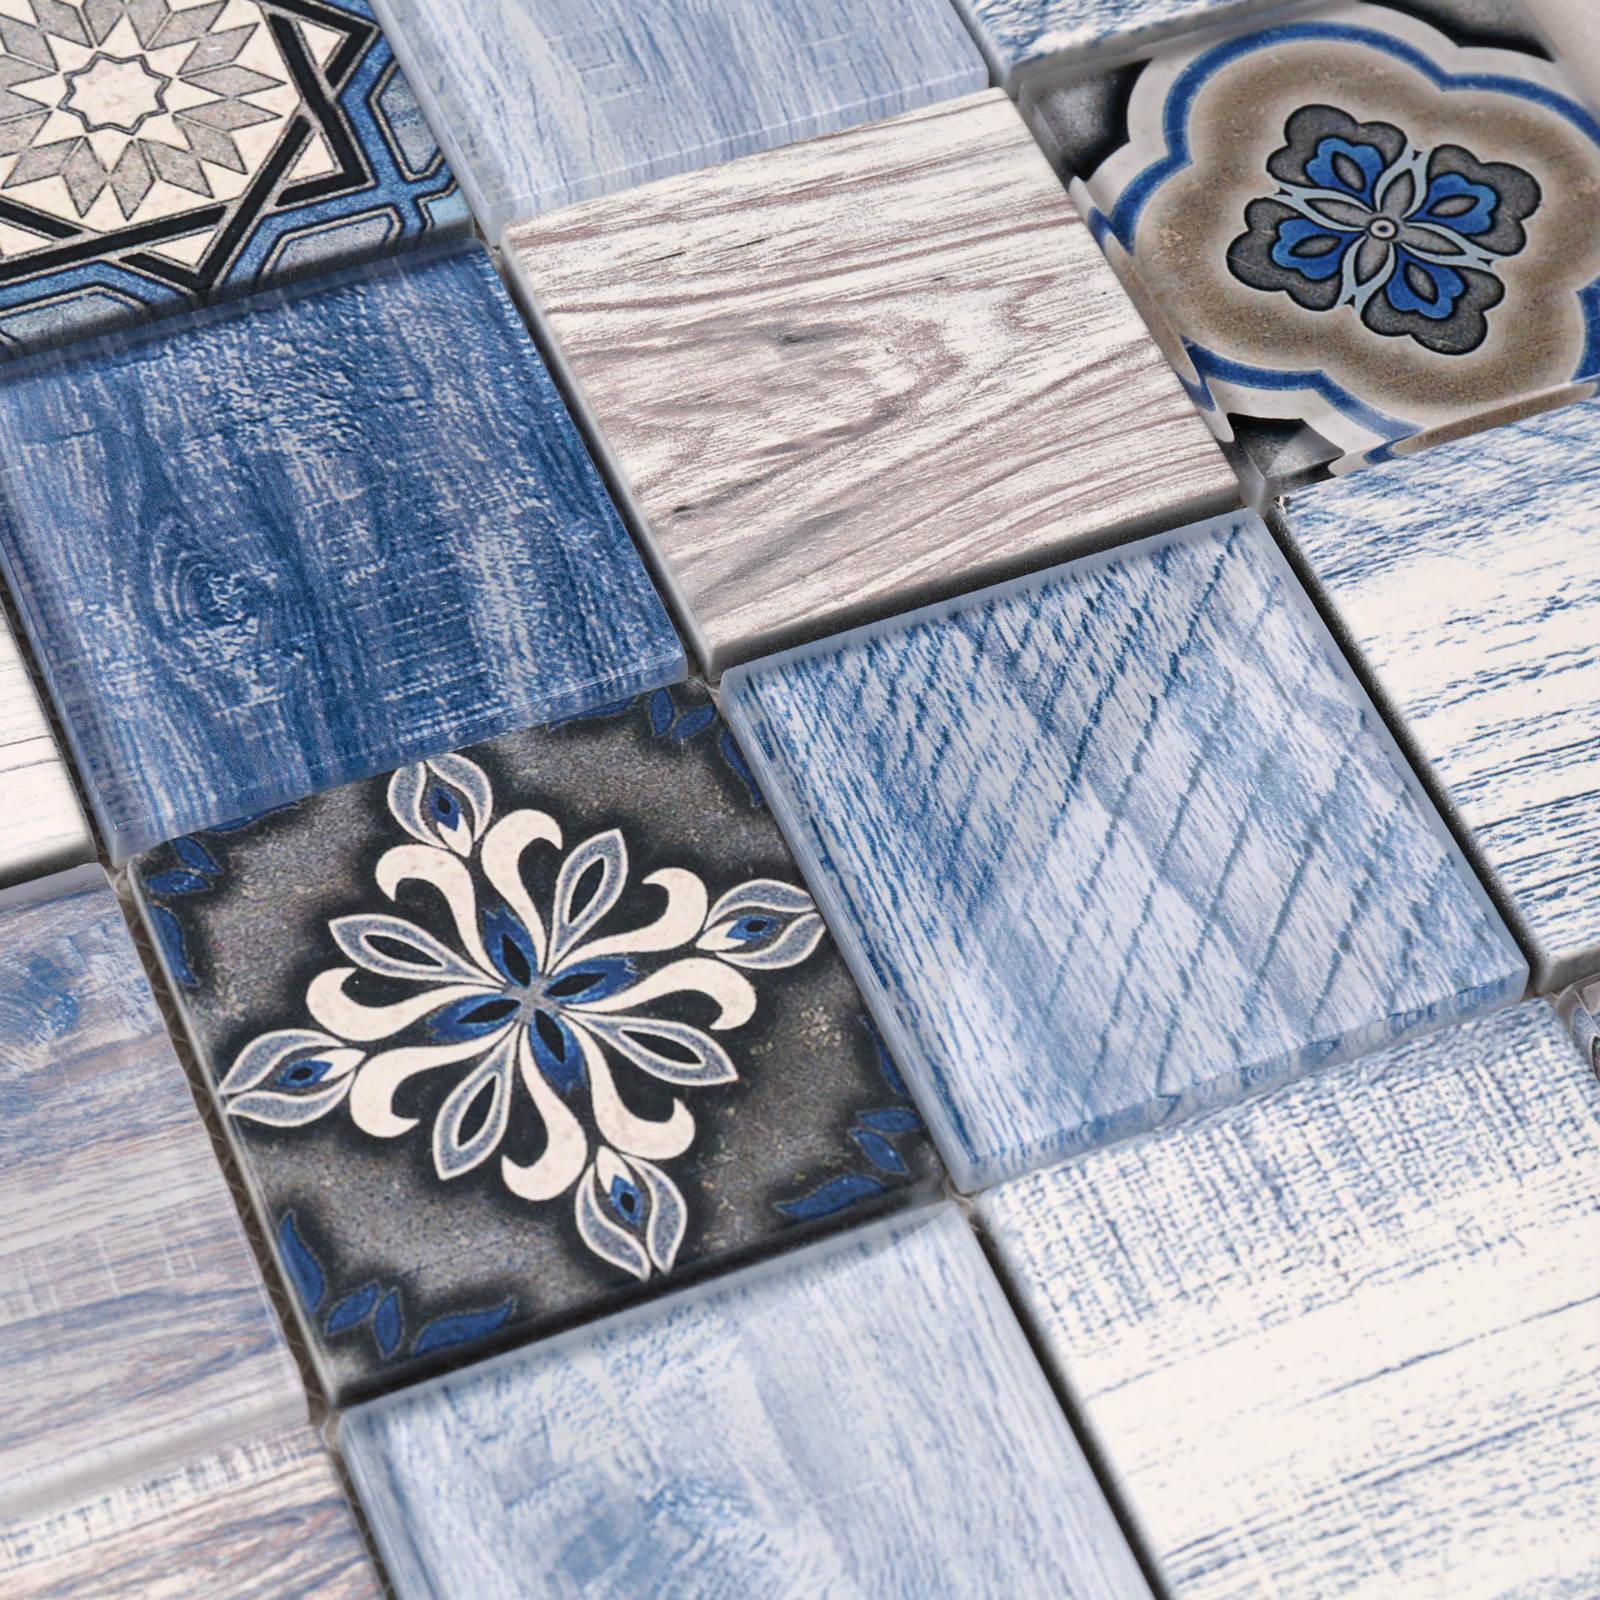 Heng Xing-Oem Green Glass Tile Manufacturer, Glass Metal Mix Mosaic Tiles | Heng Xing-1